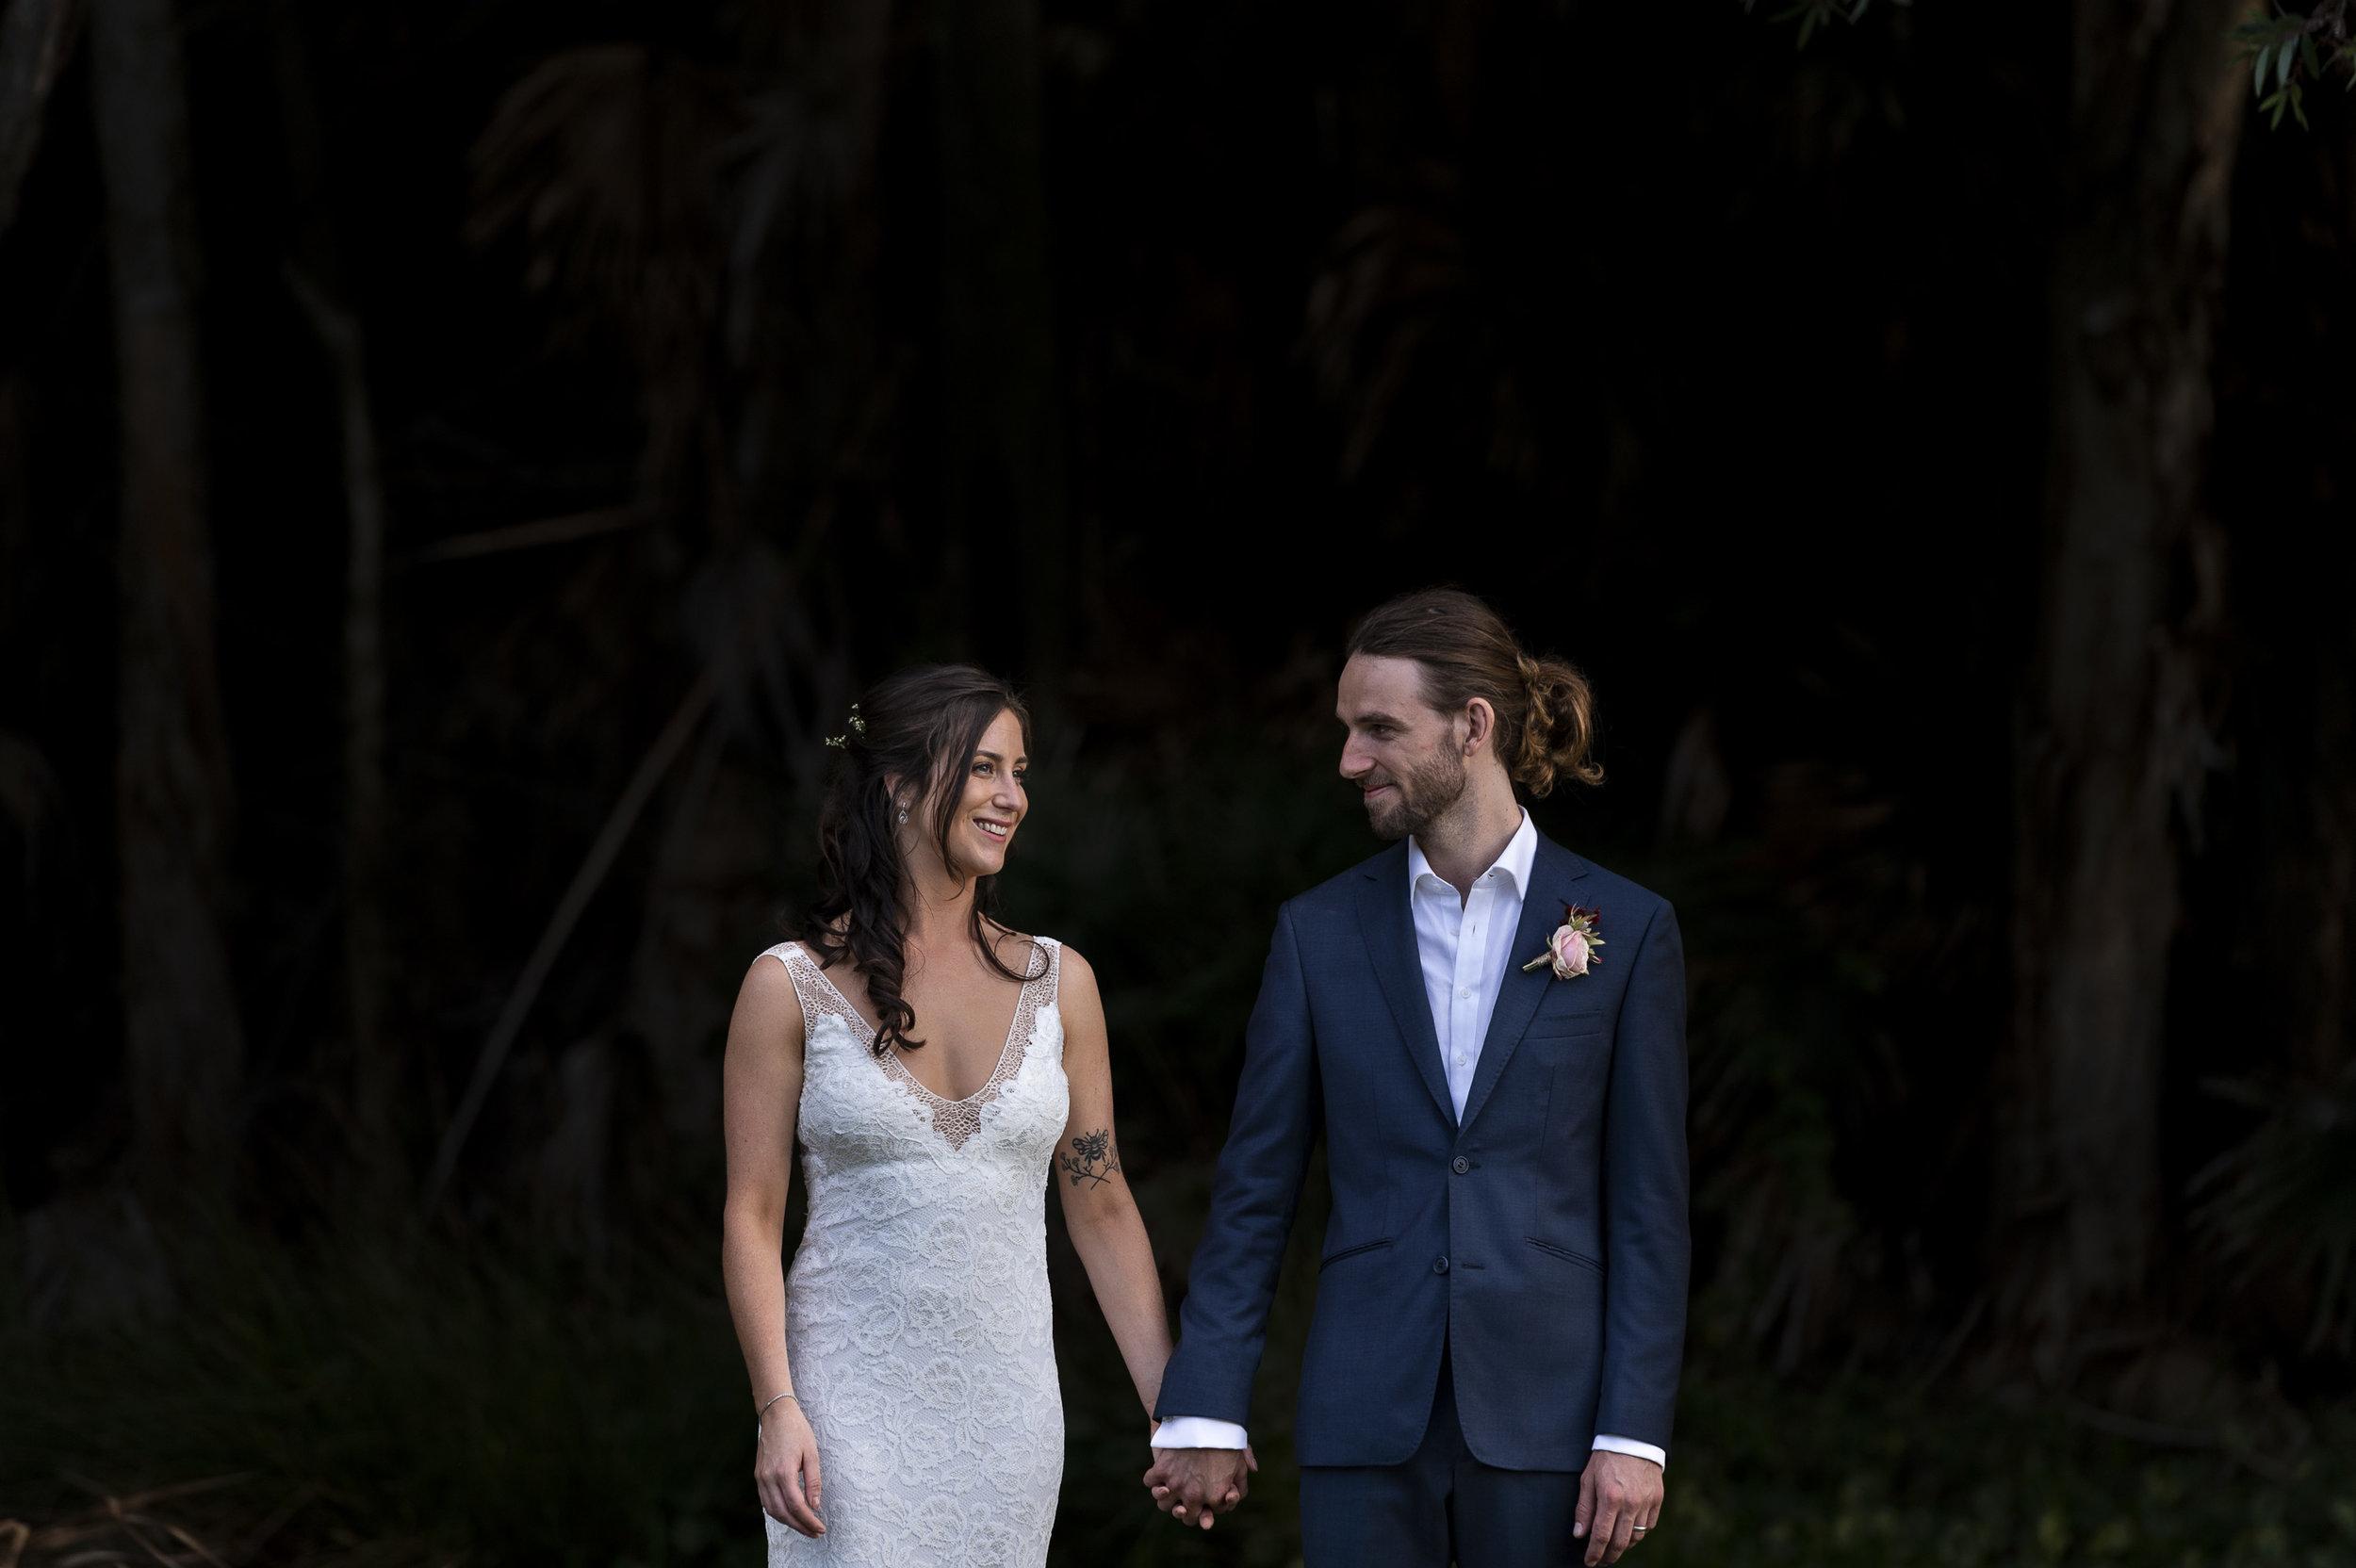 weddings by atelier photography-wedding-31.jpg